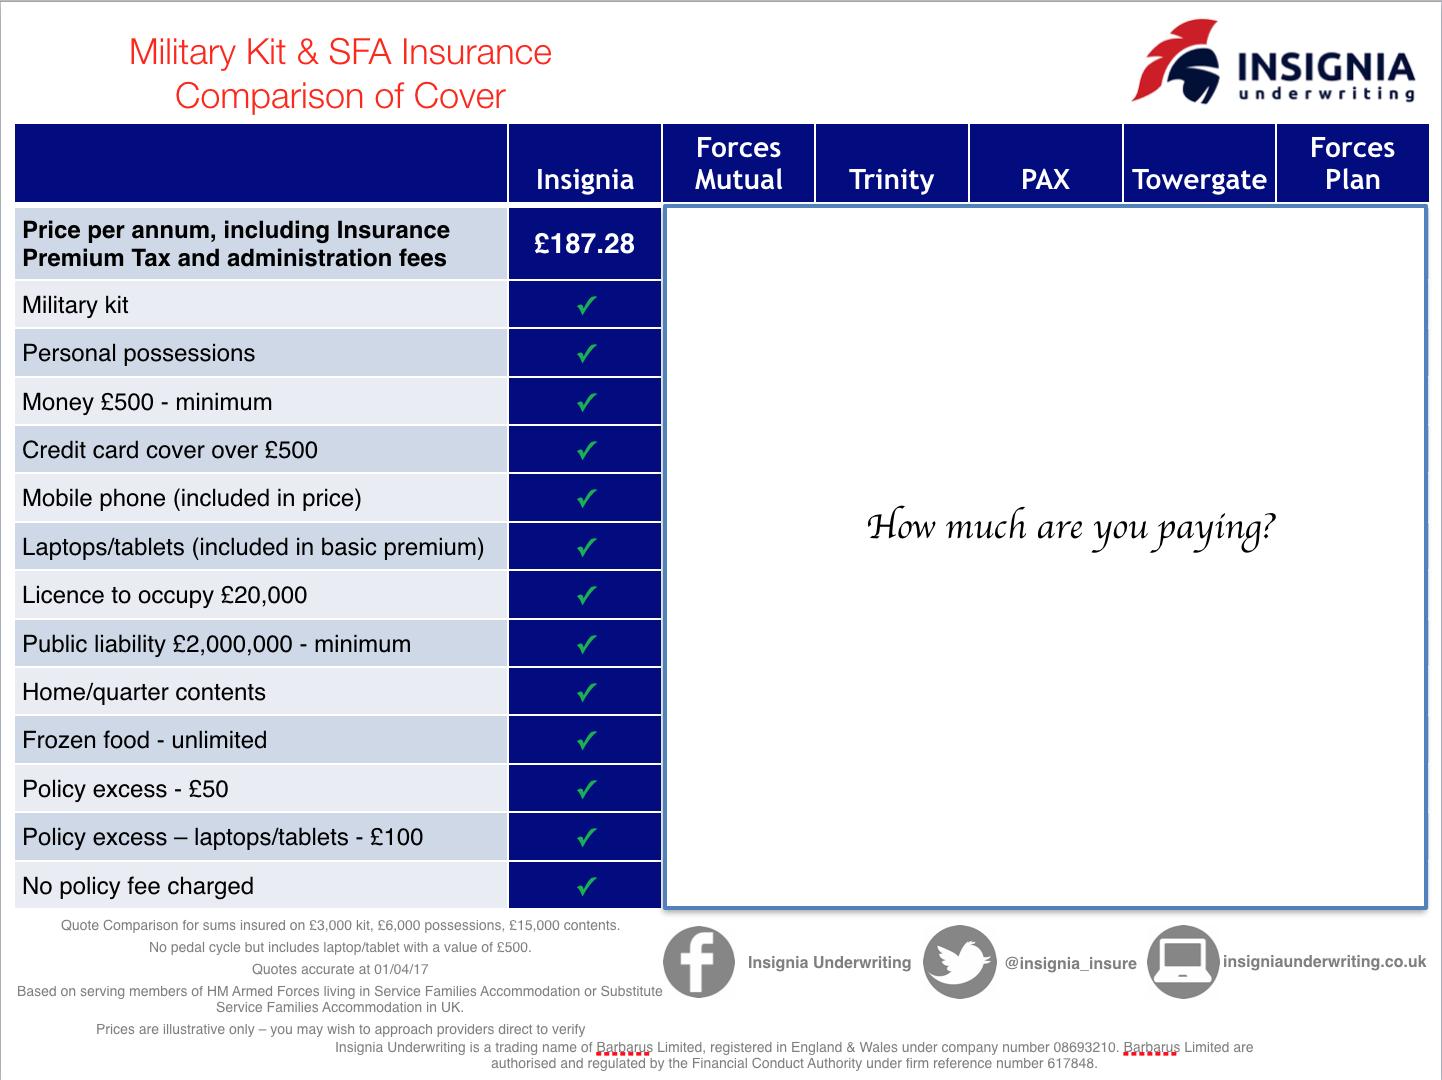 Military-kit-insurance